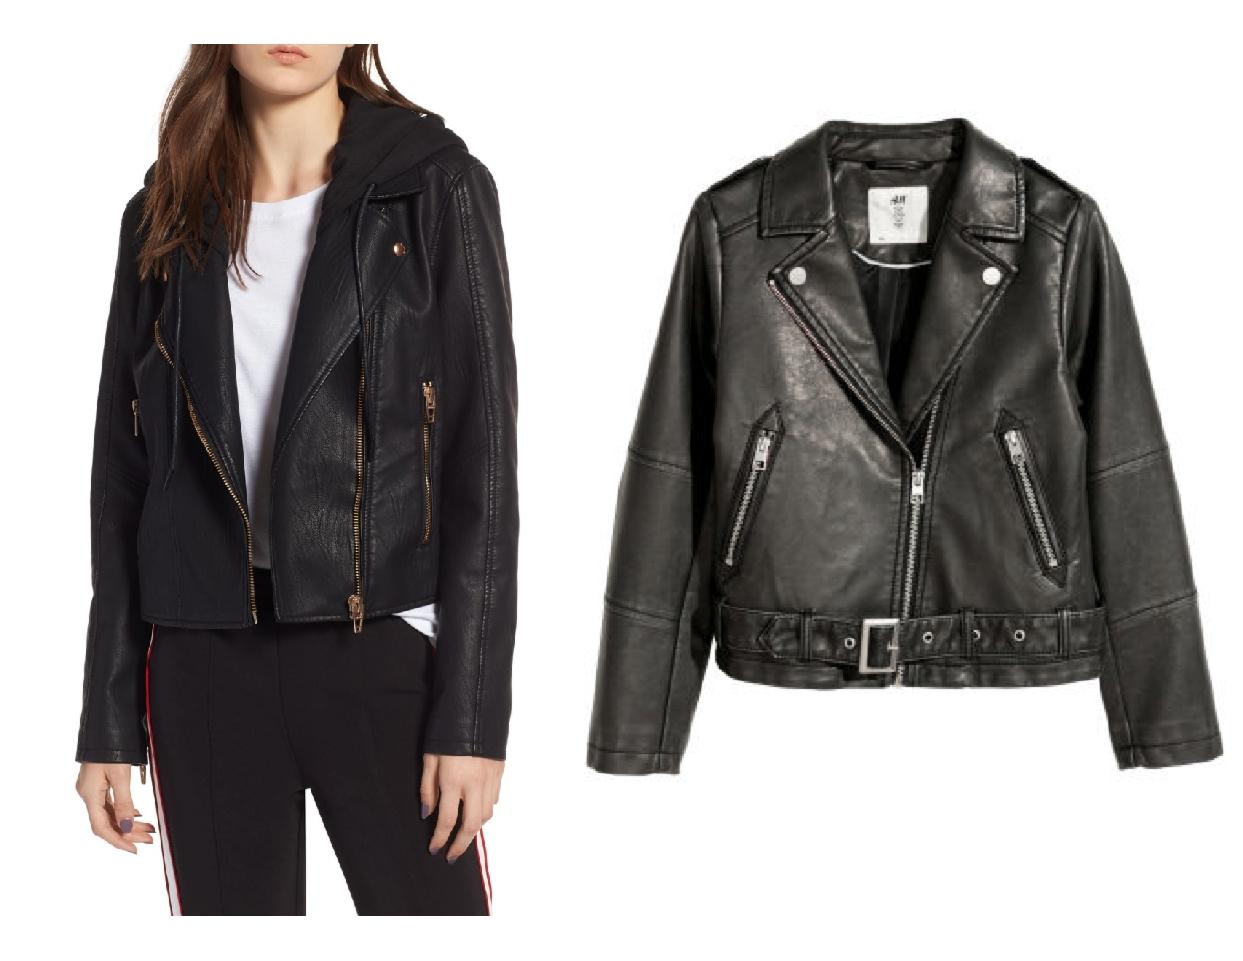 nordstrom anniversary sale dupes, black moto jacket